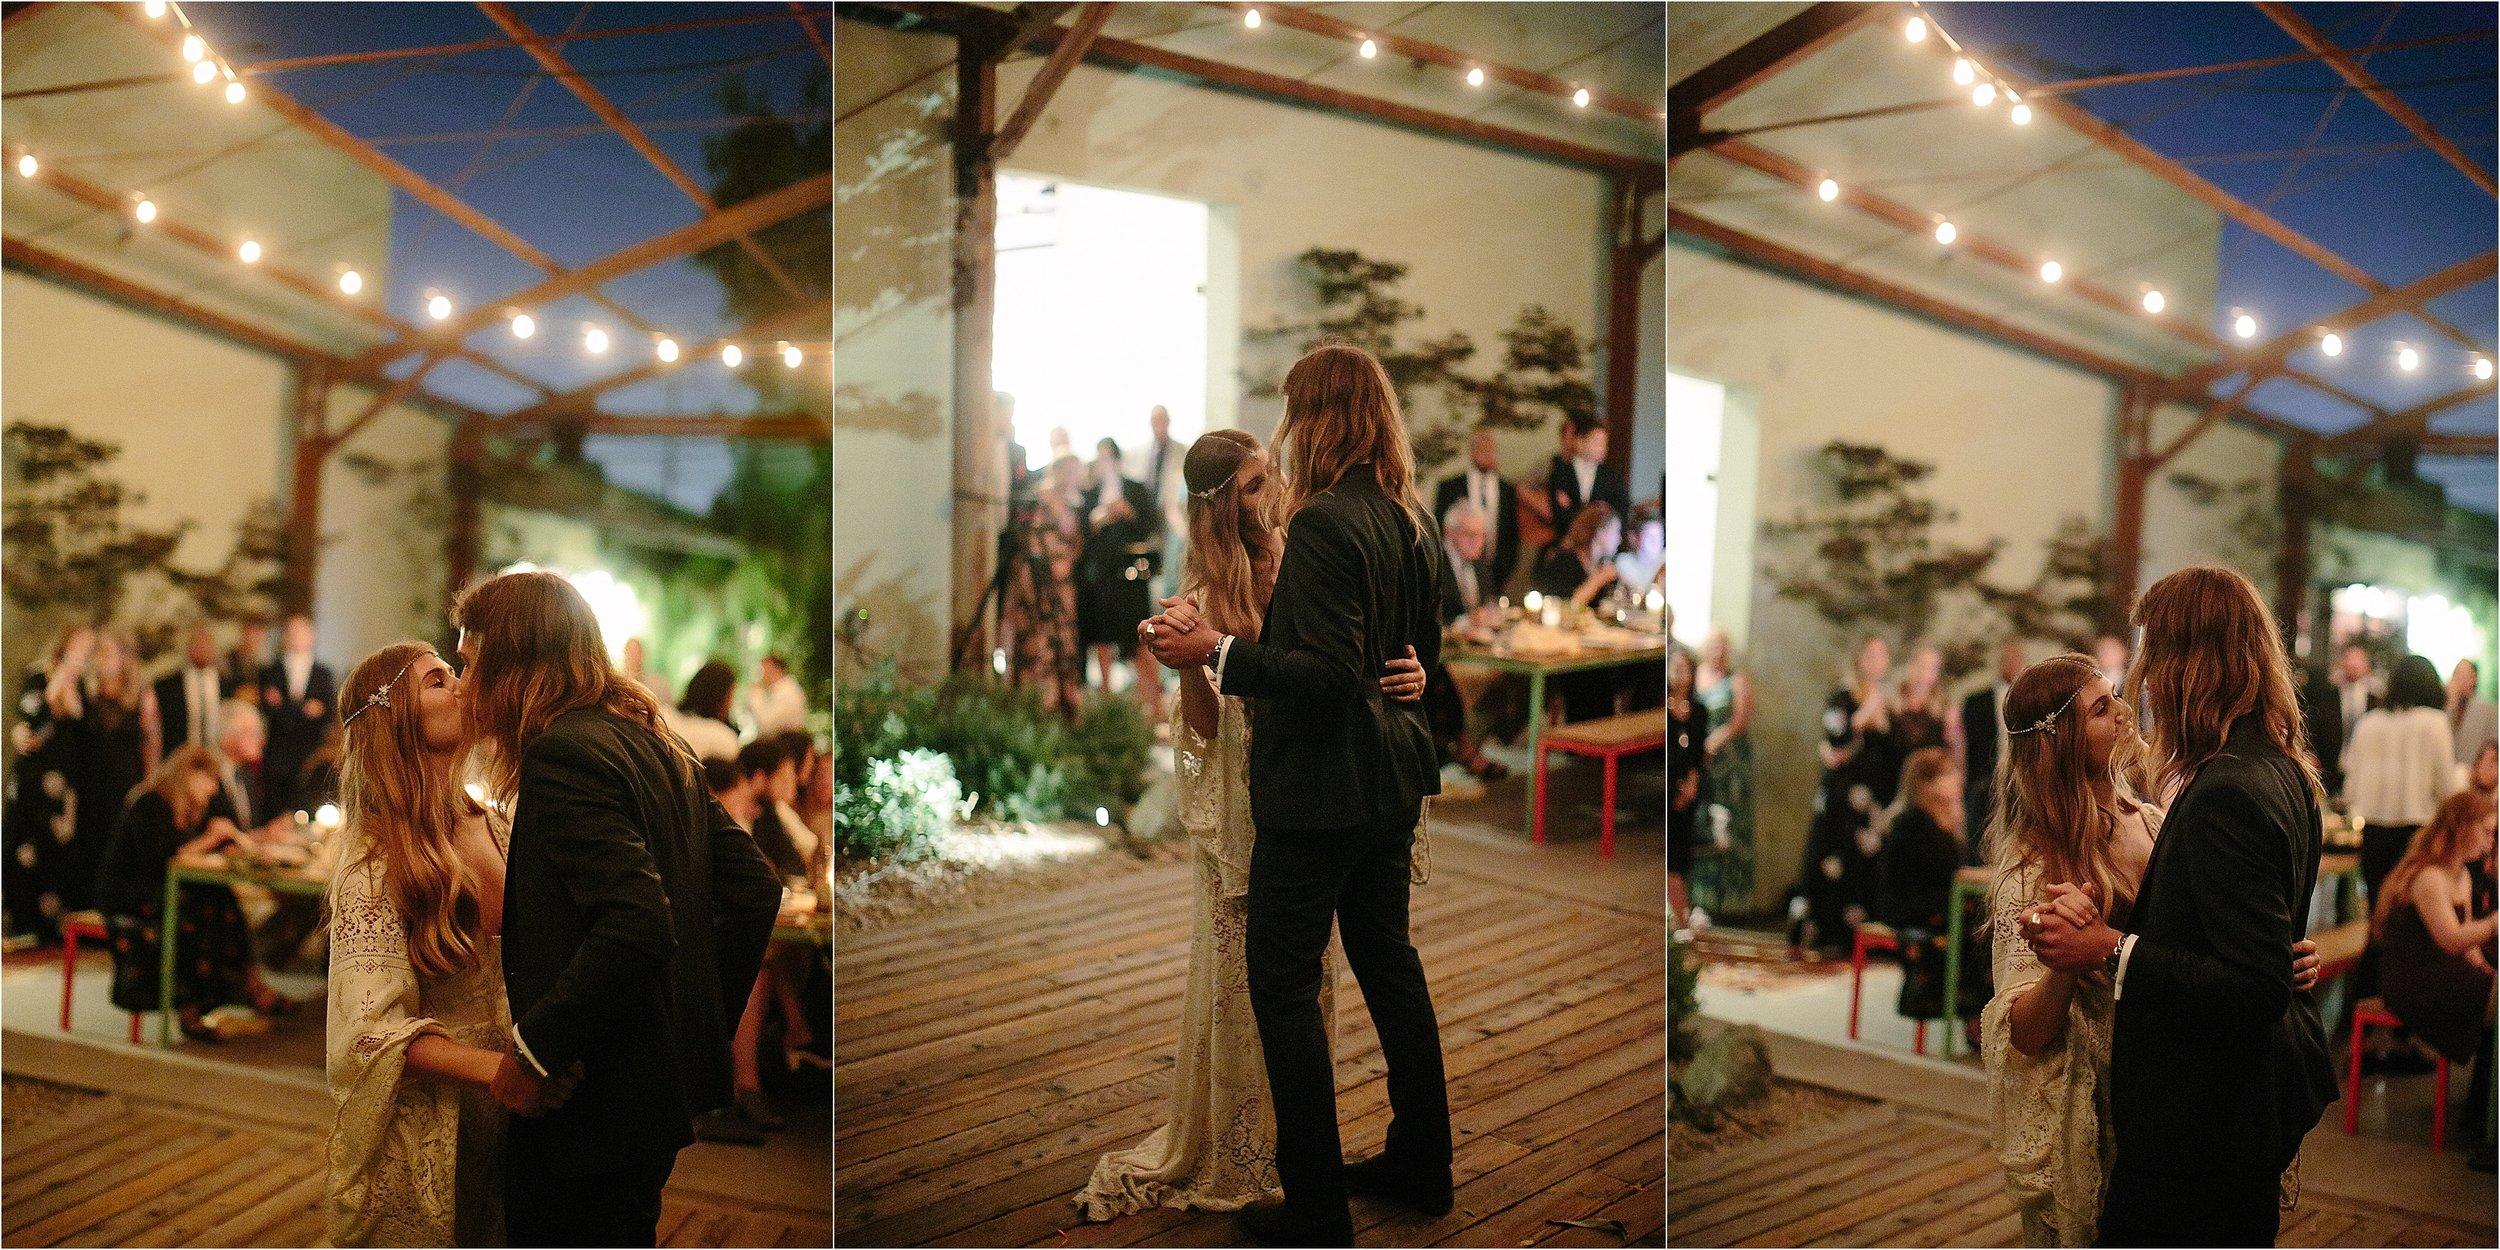 Romantic First Dance Photo